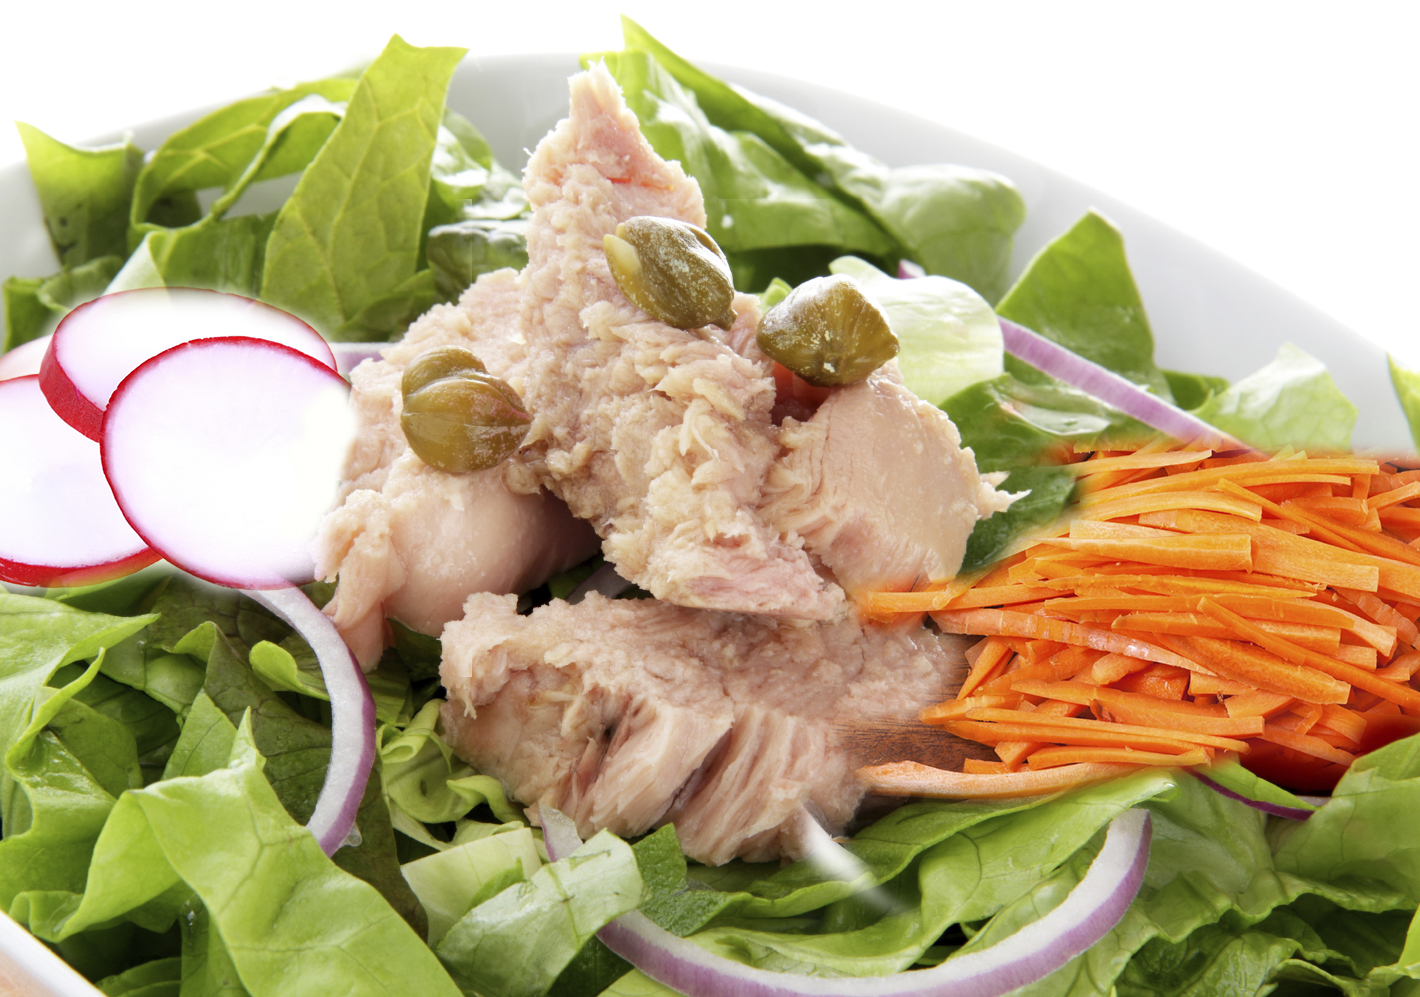 Tuna, radish and carrot salad